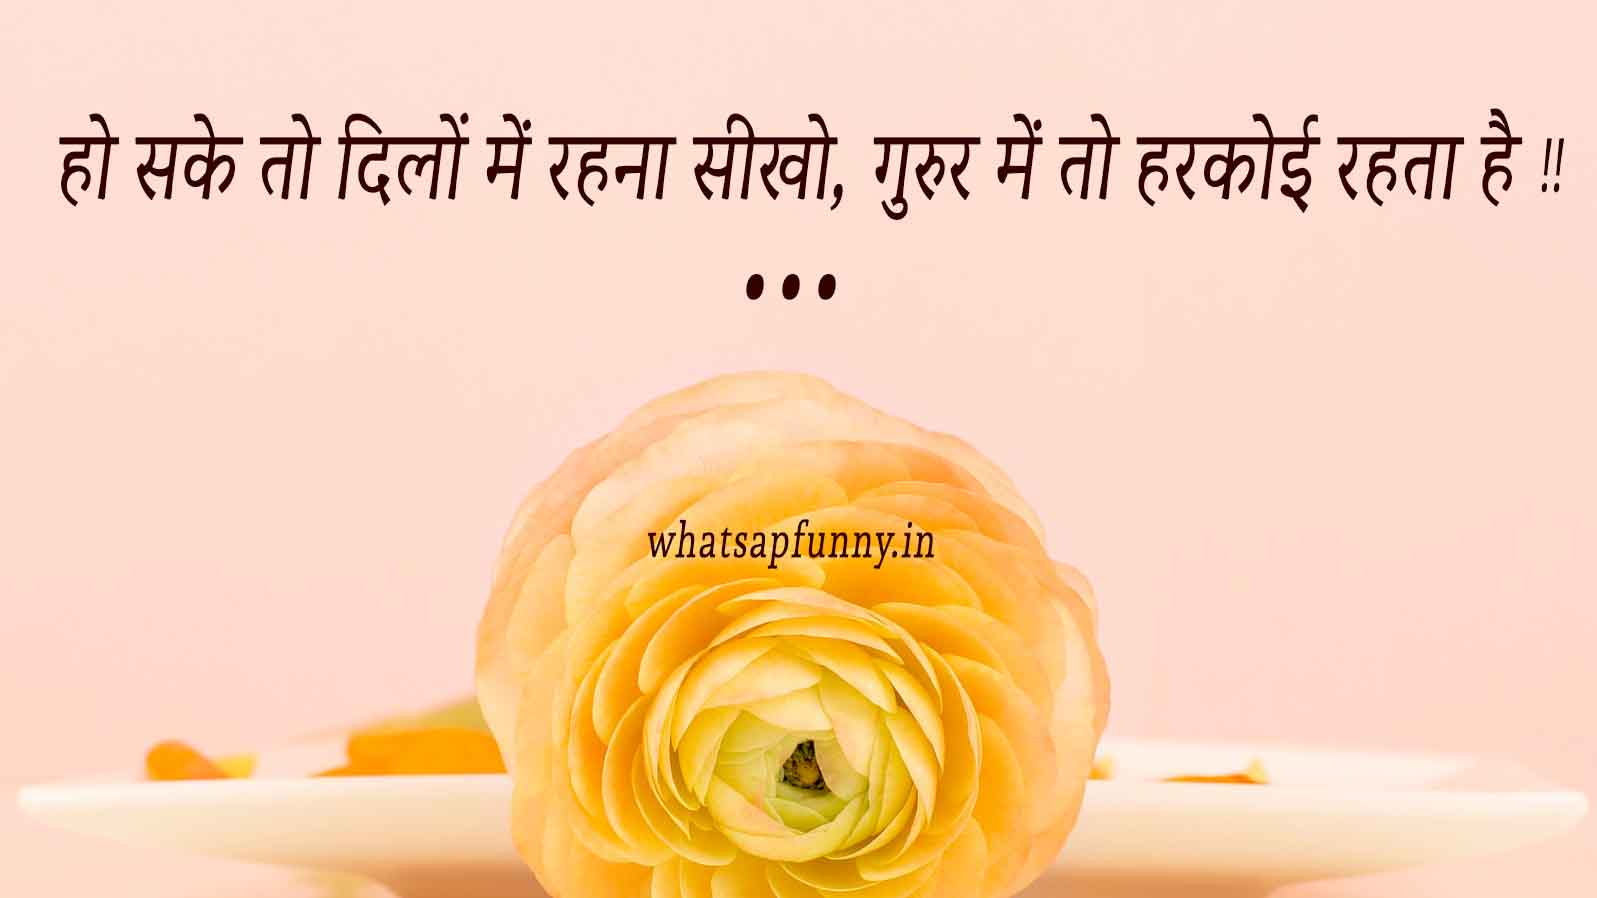 whatsapp dp on life - hindi quotes